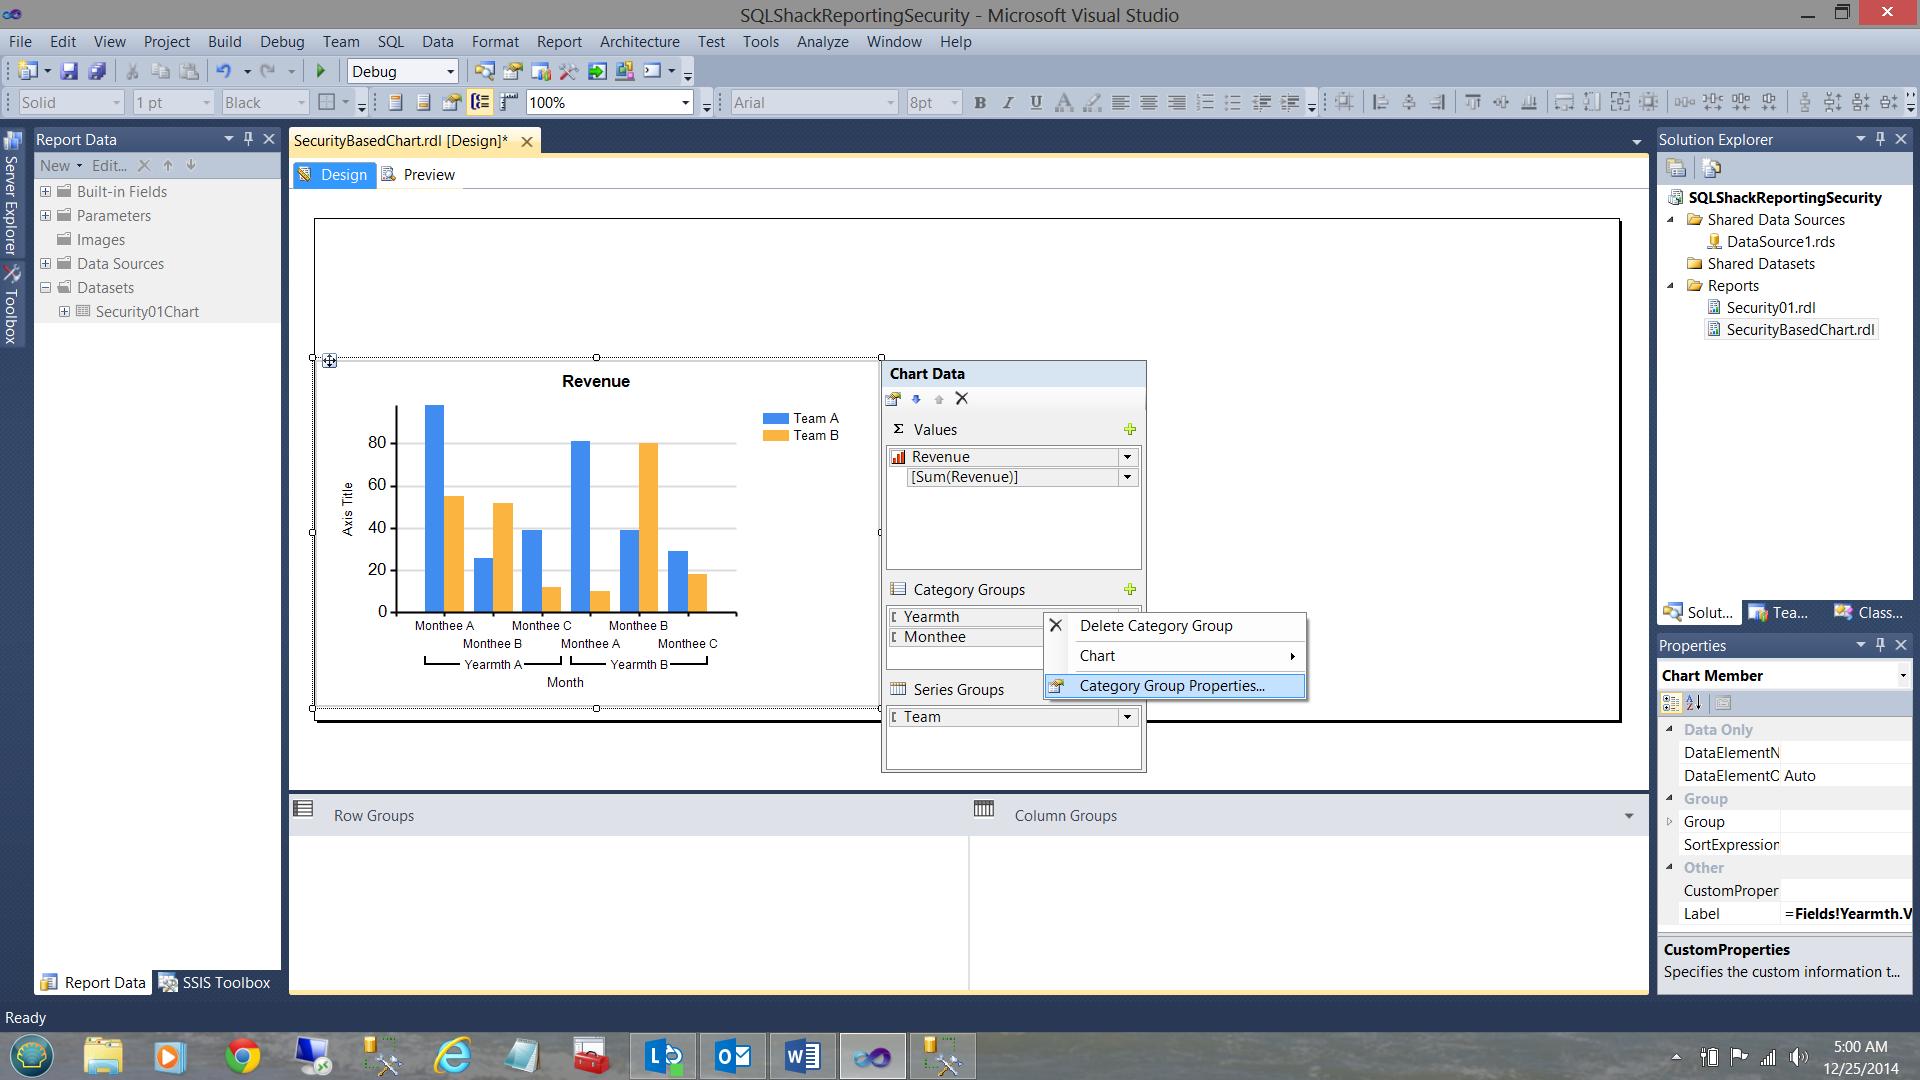 SQL Server安全机制–如何控制用户能够在报告中查看哪些数据24